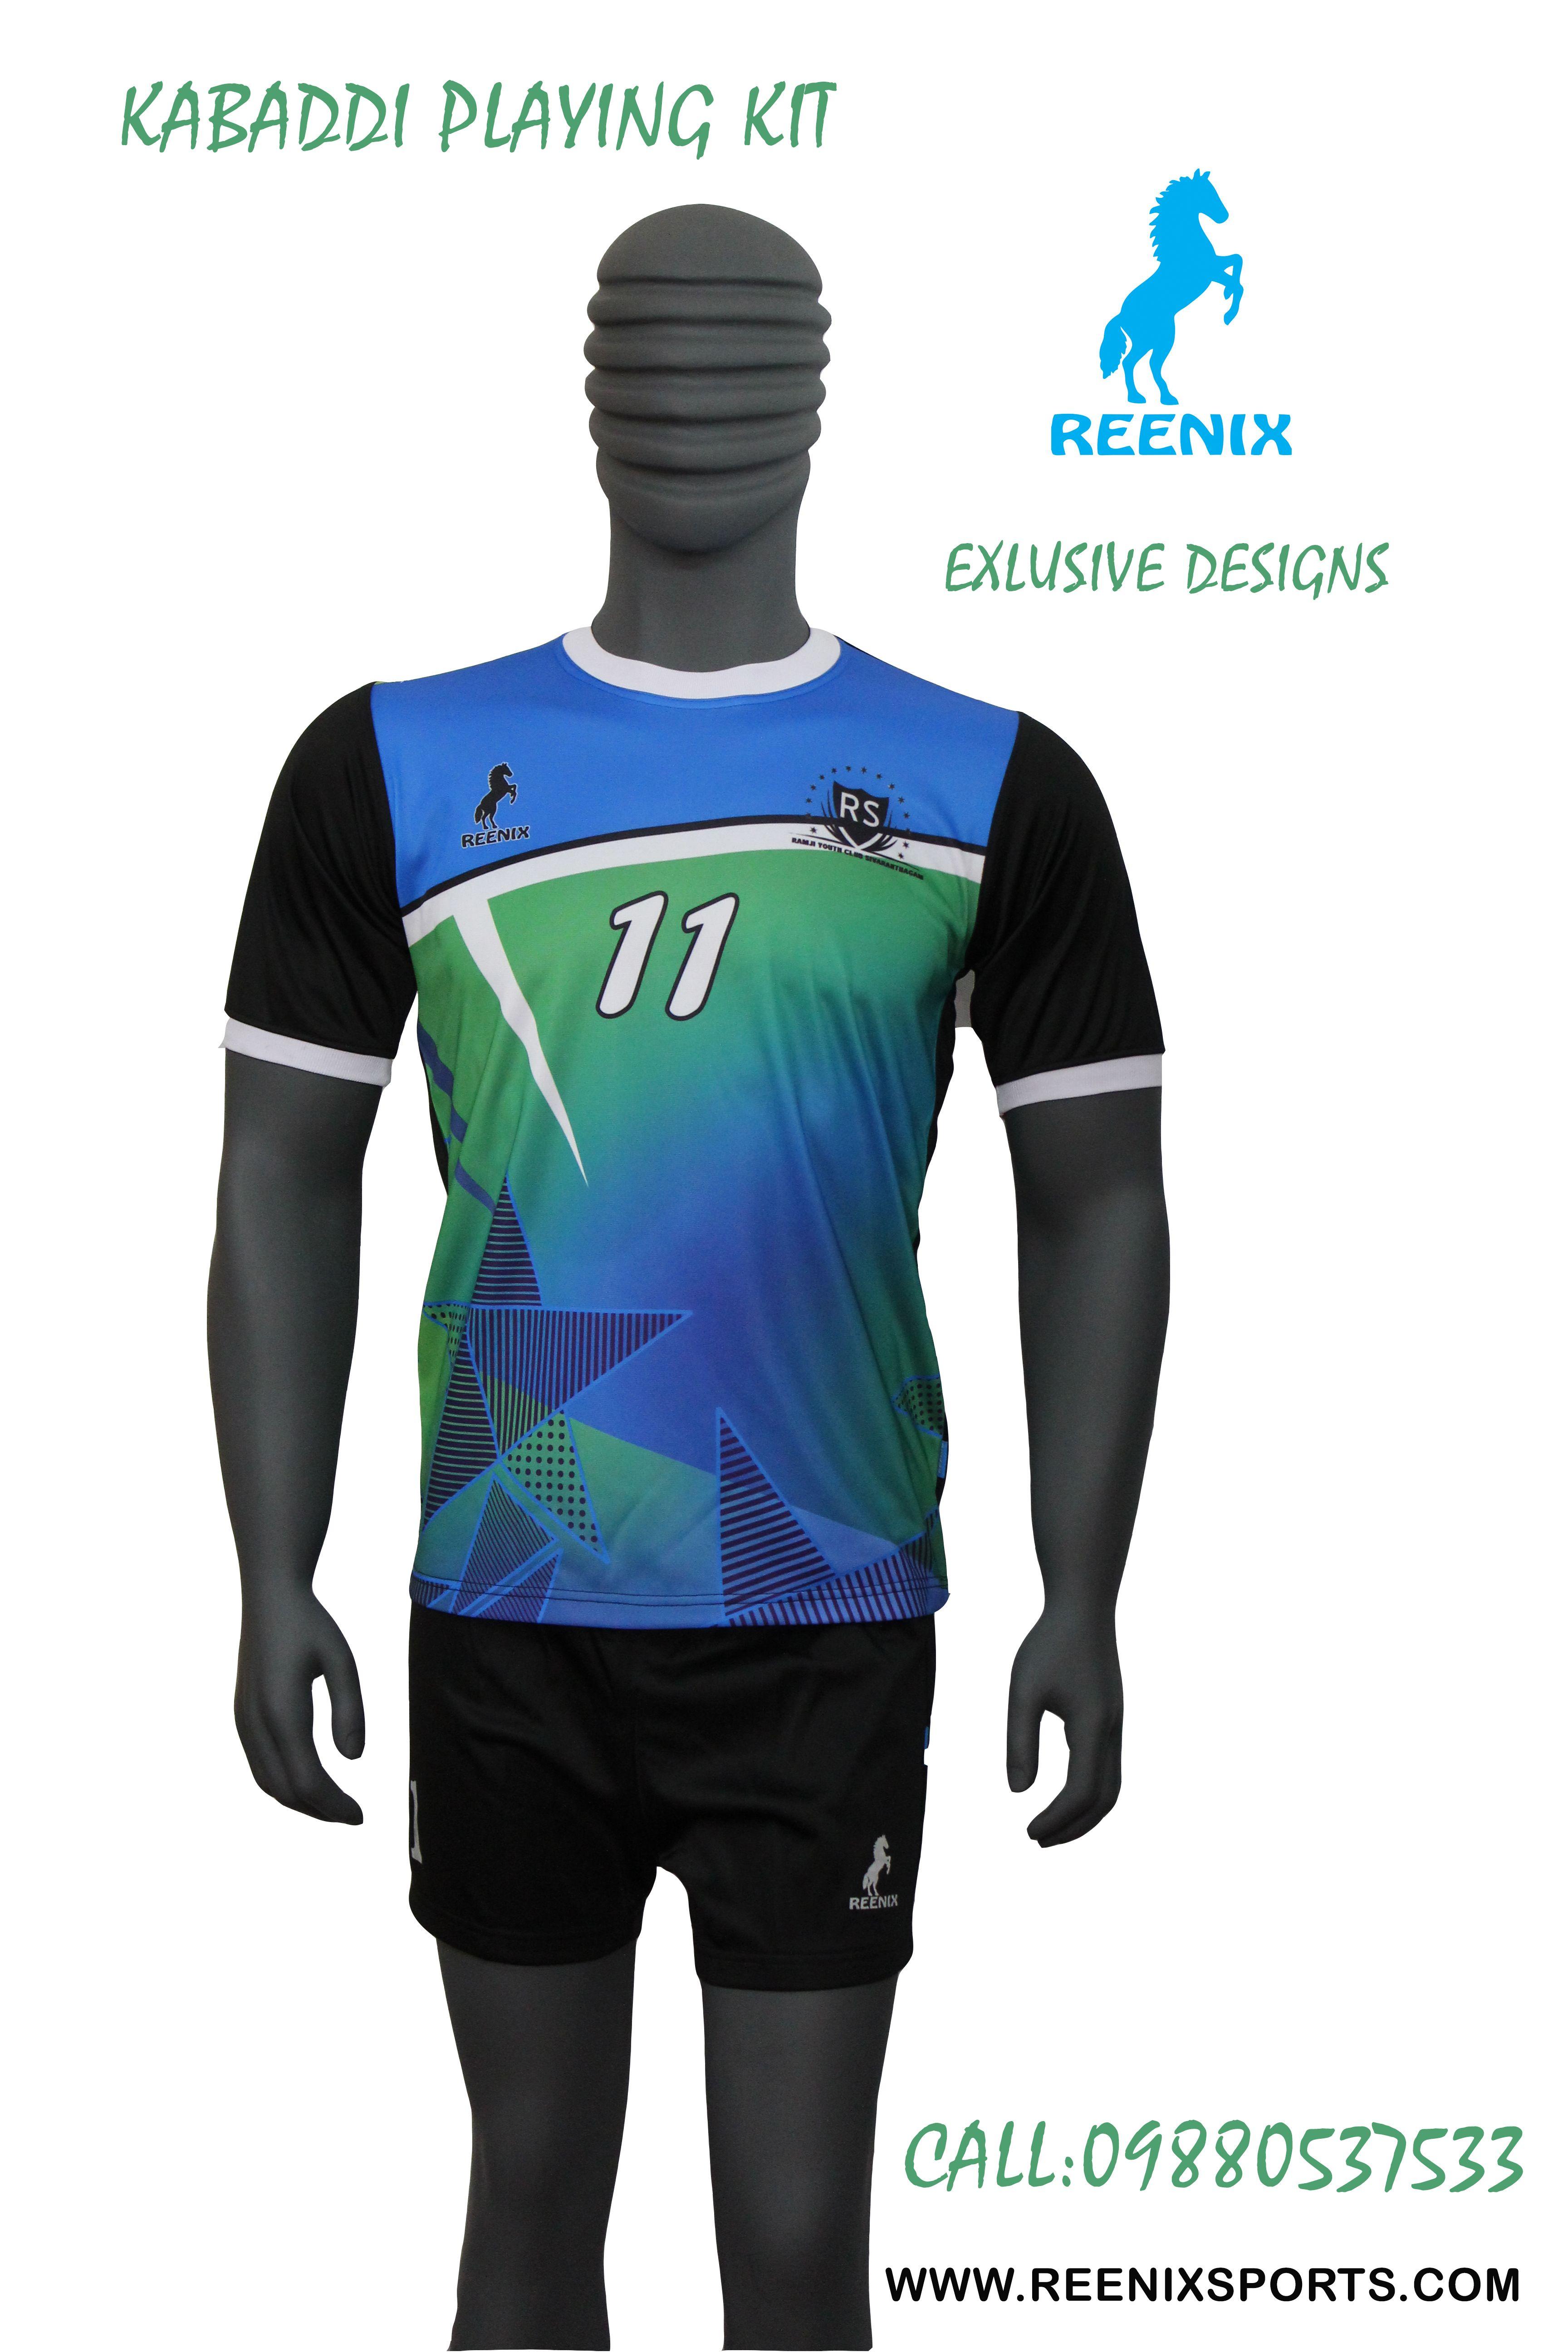 Design a t shirt kit - Trendy Kabaddi Playing Kit Blue